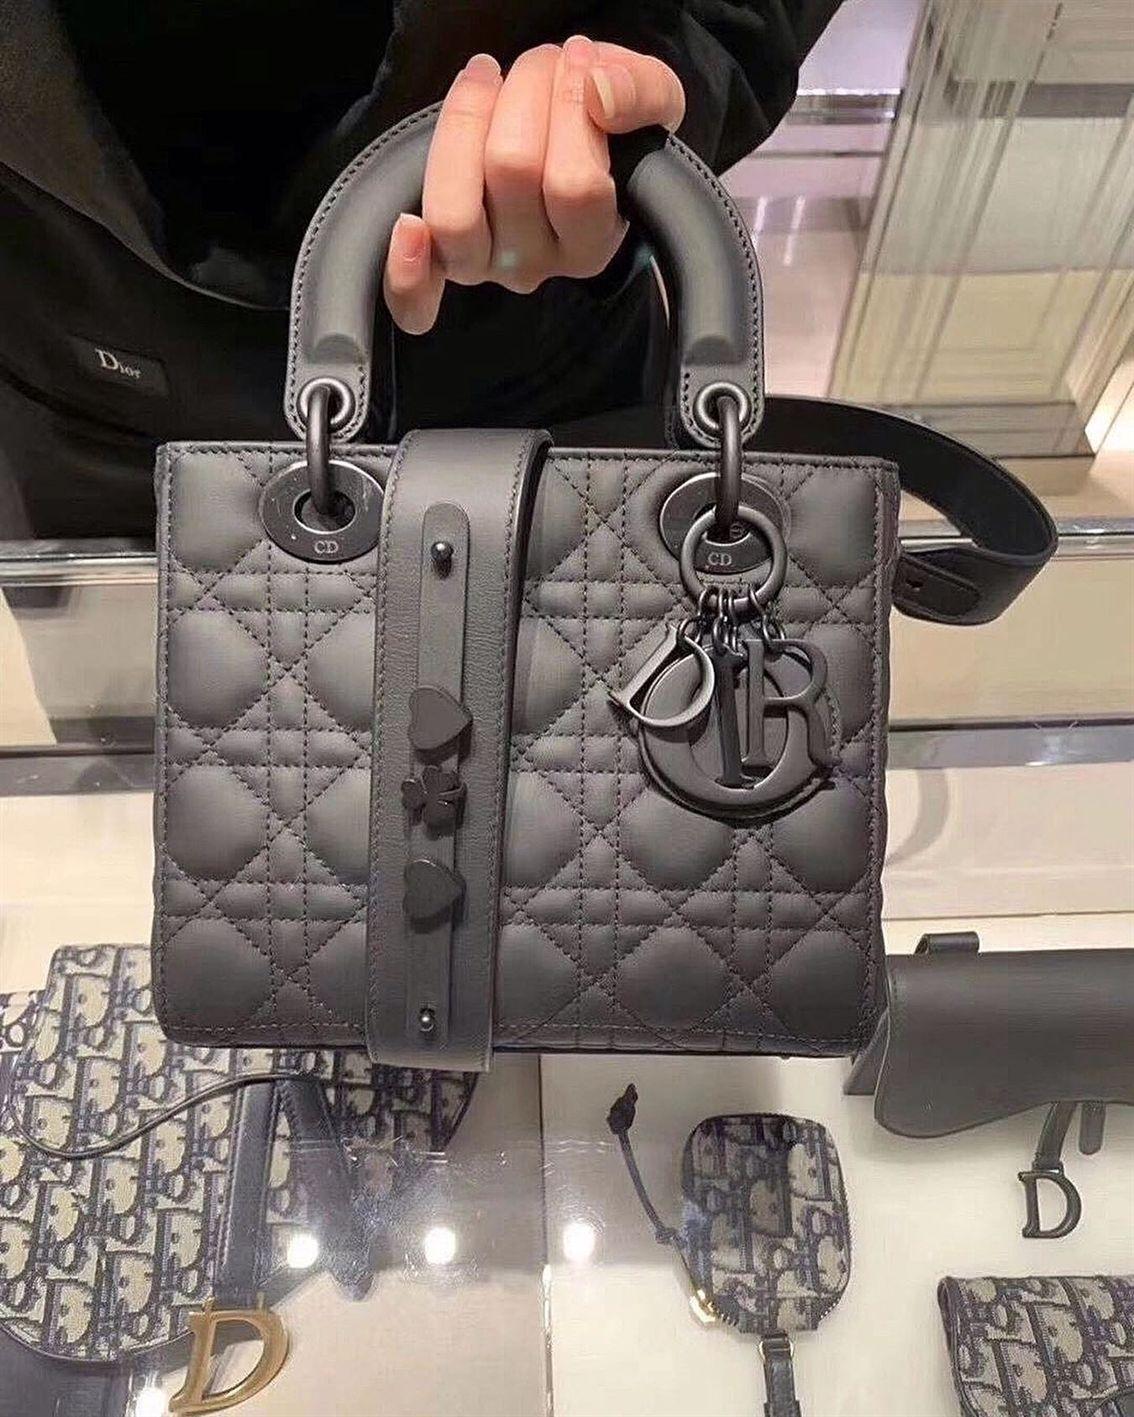 Best High Quality Replica Hermes bag | Hermes uk |